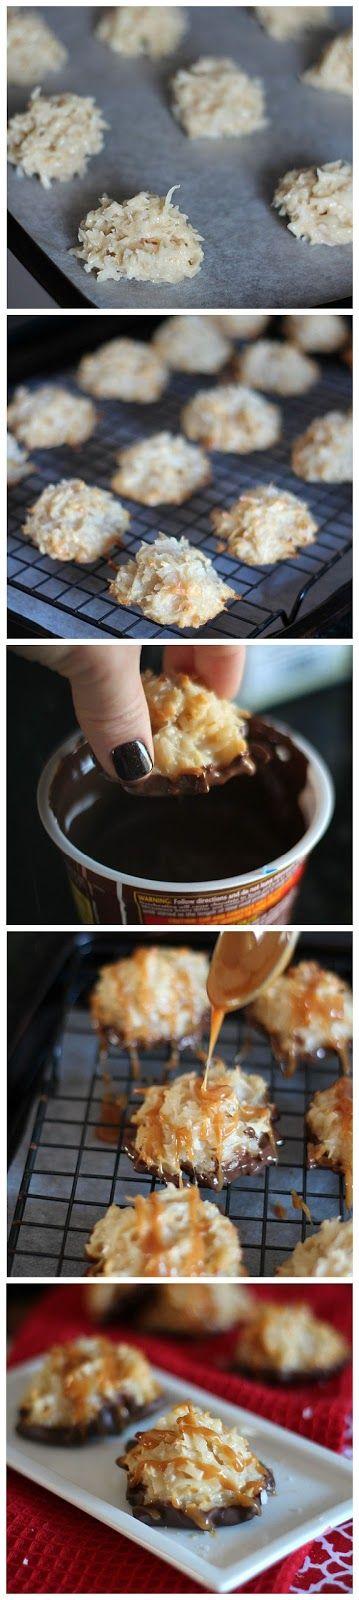 Salted Caramel Coconut Macaroons Recipe